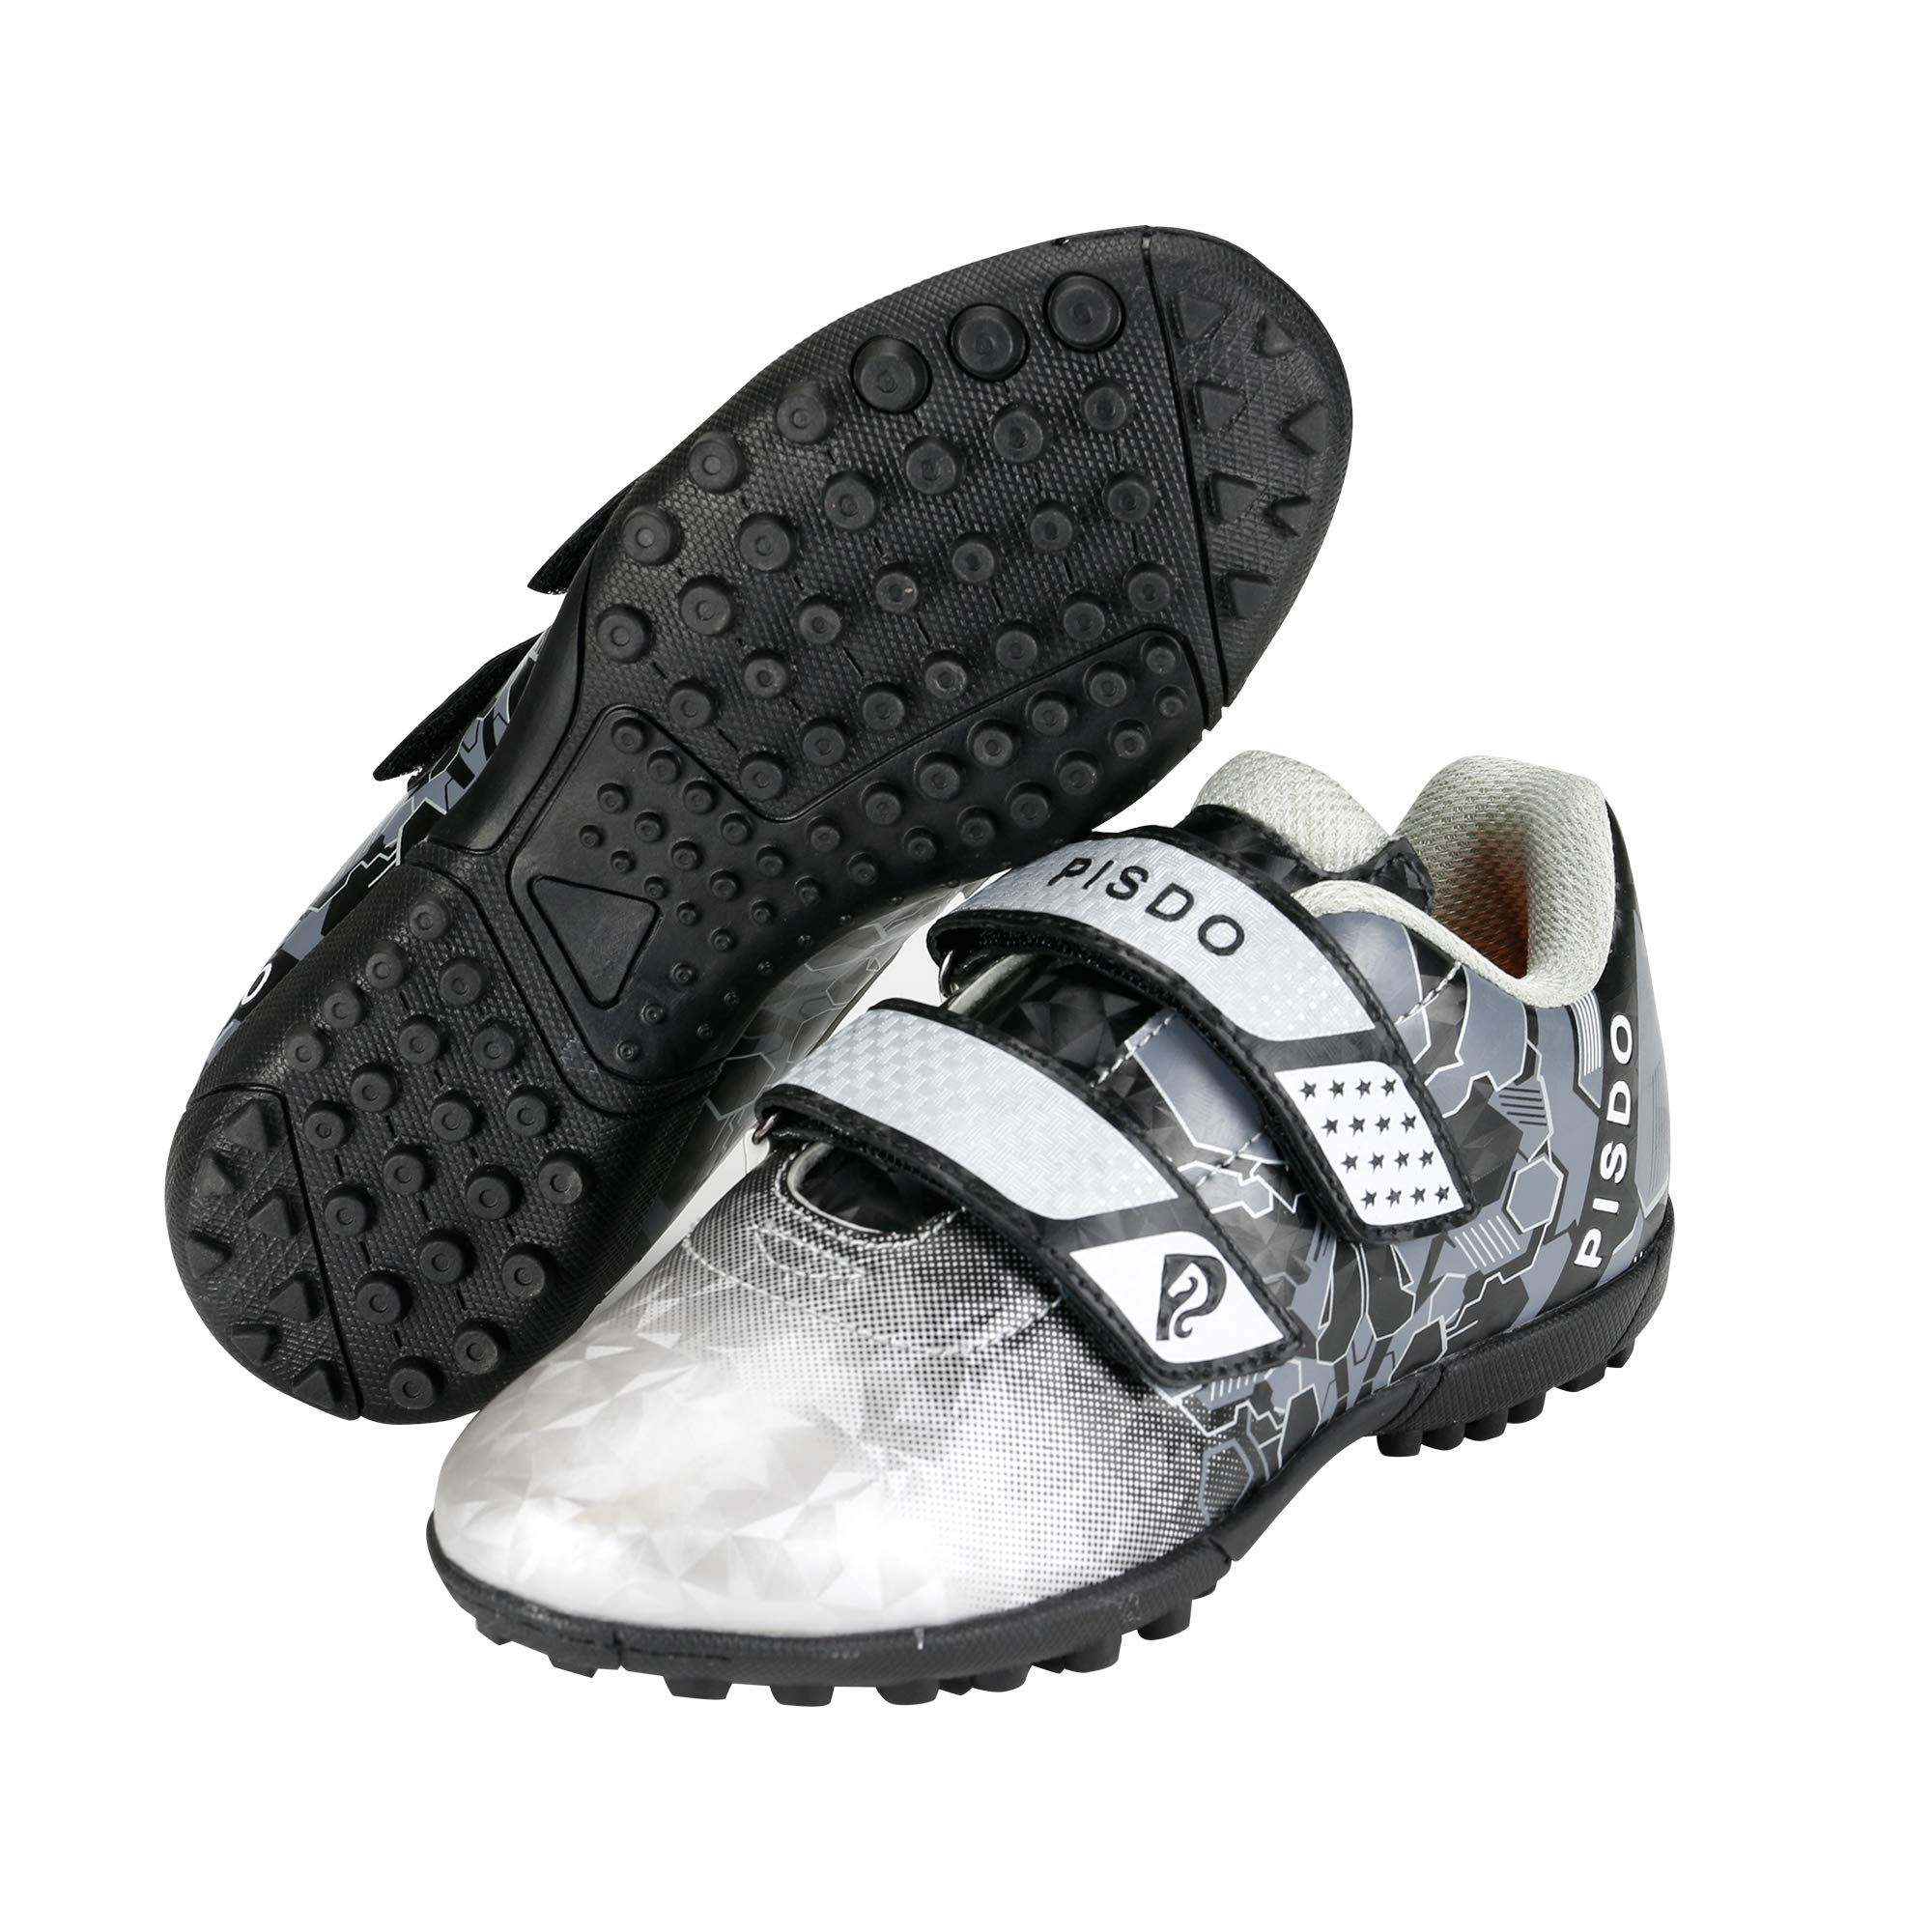 PISDO Kids Soccer Cleats Indoor/Outdoor Training Turf Soccer Shoes for Boys and Girls (Little Kids/Big Kids) Black 3